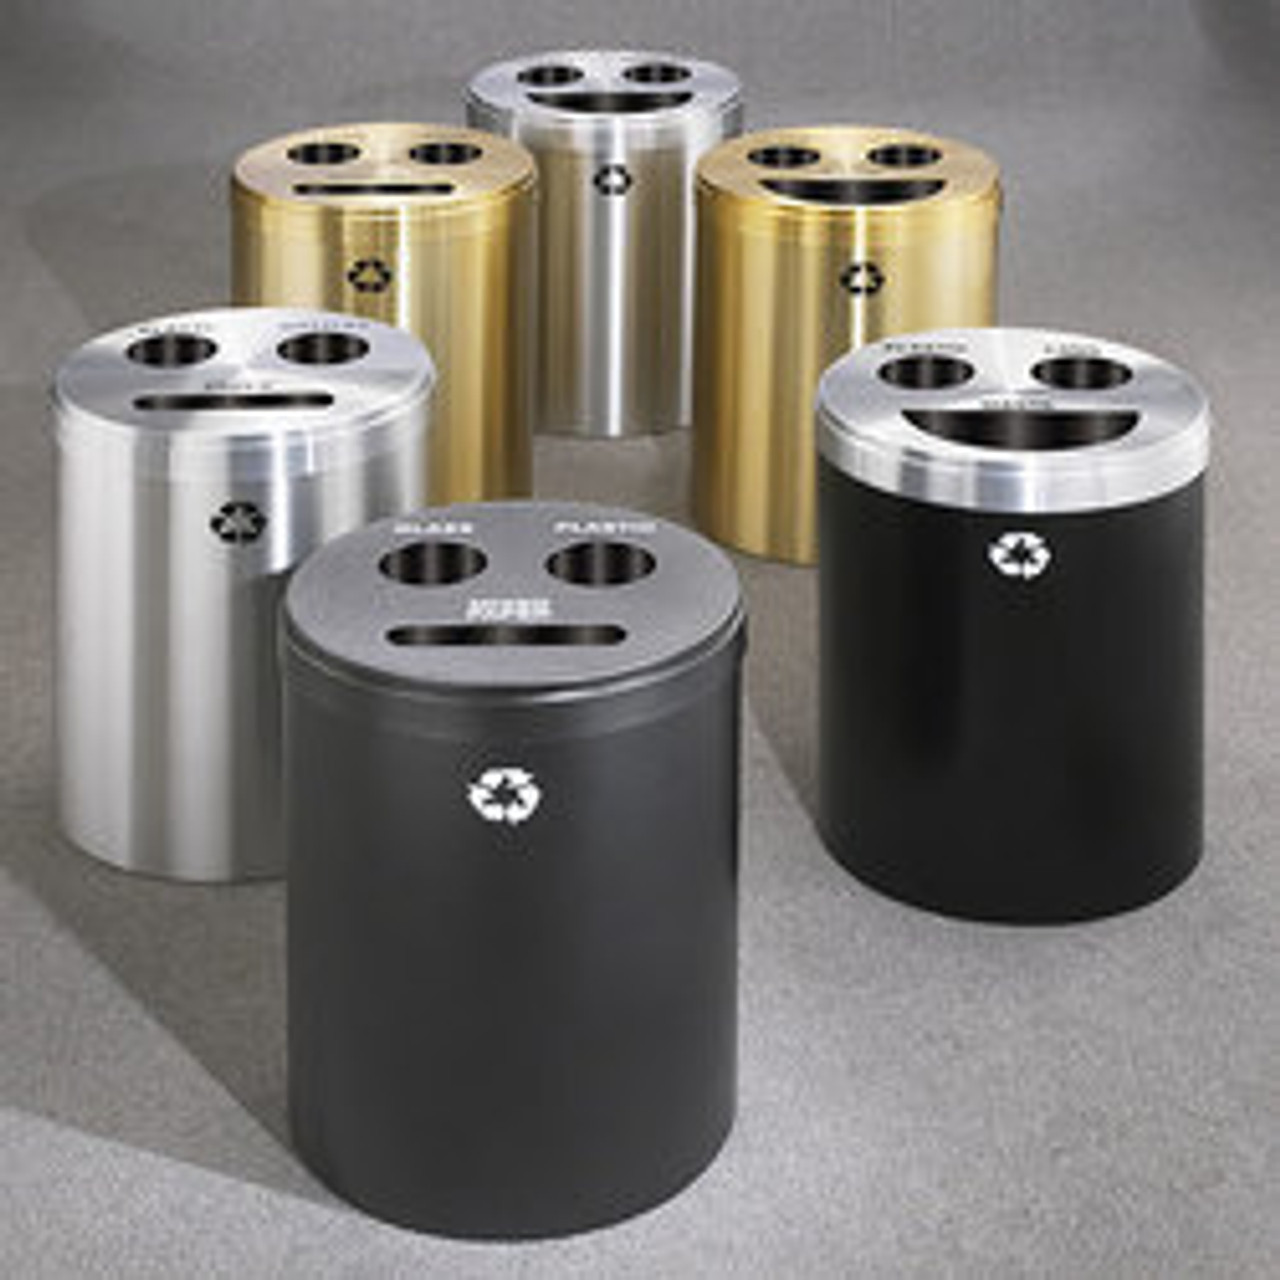 Glaro RecyclePro 3 Recycling Bins